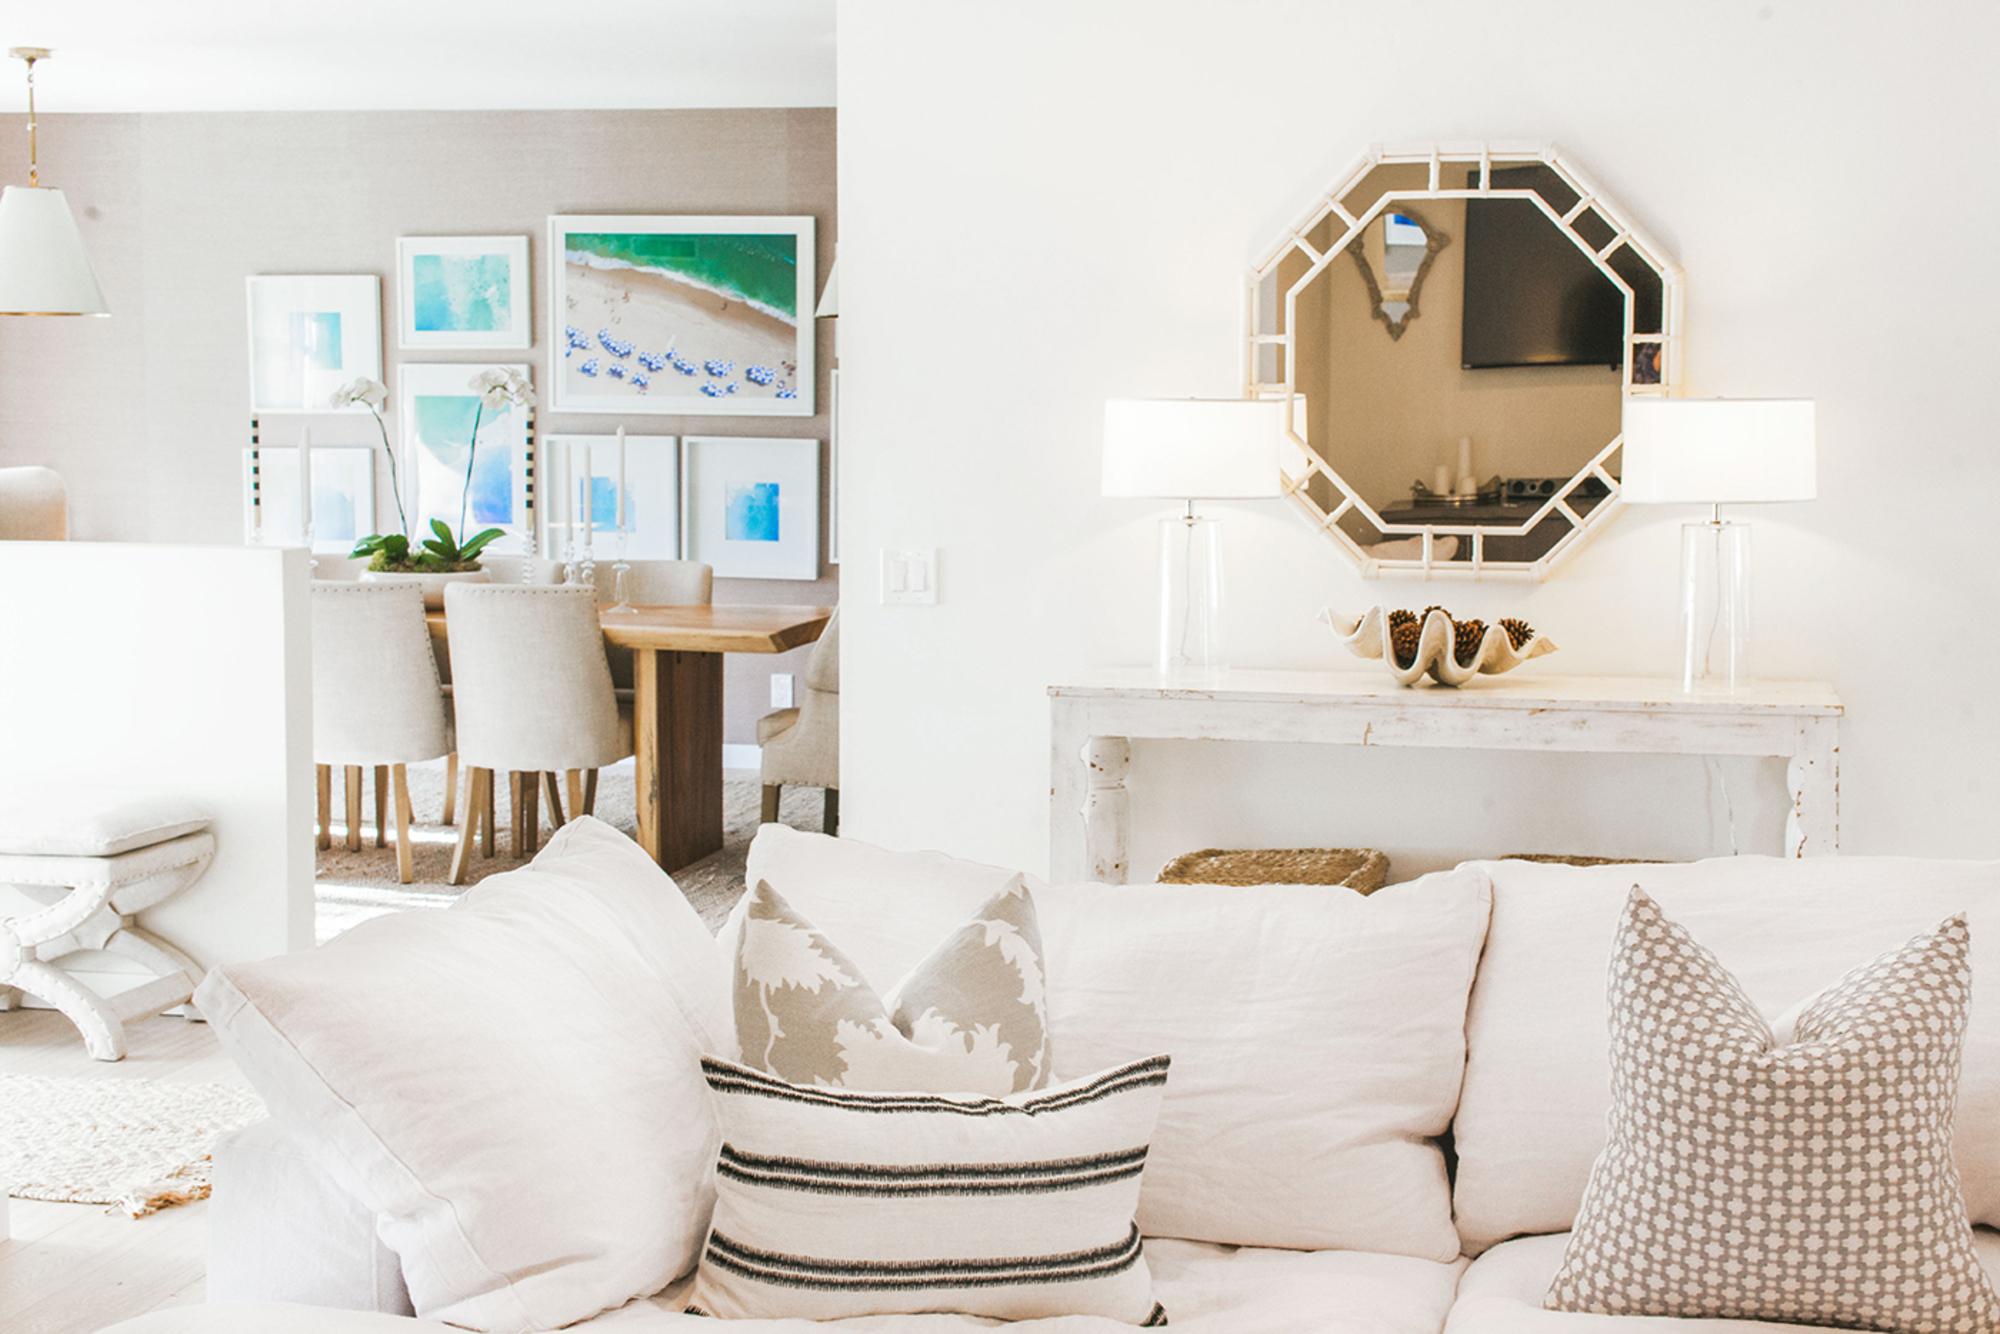 5 Questions to Ask When Hiring an Interior Designer Gray Malin